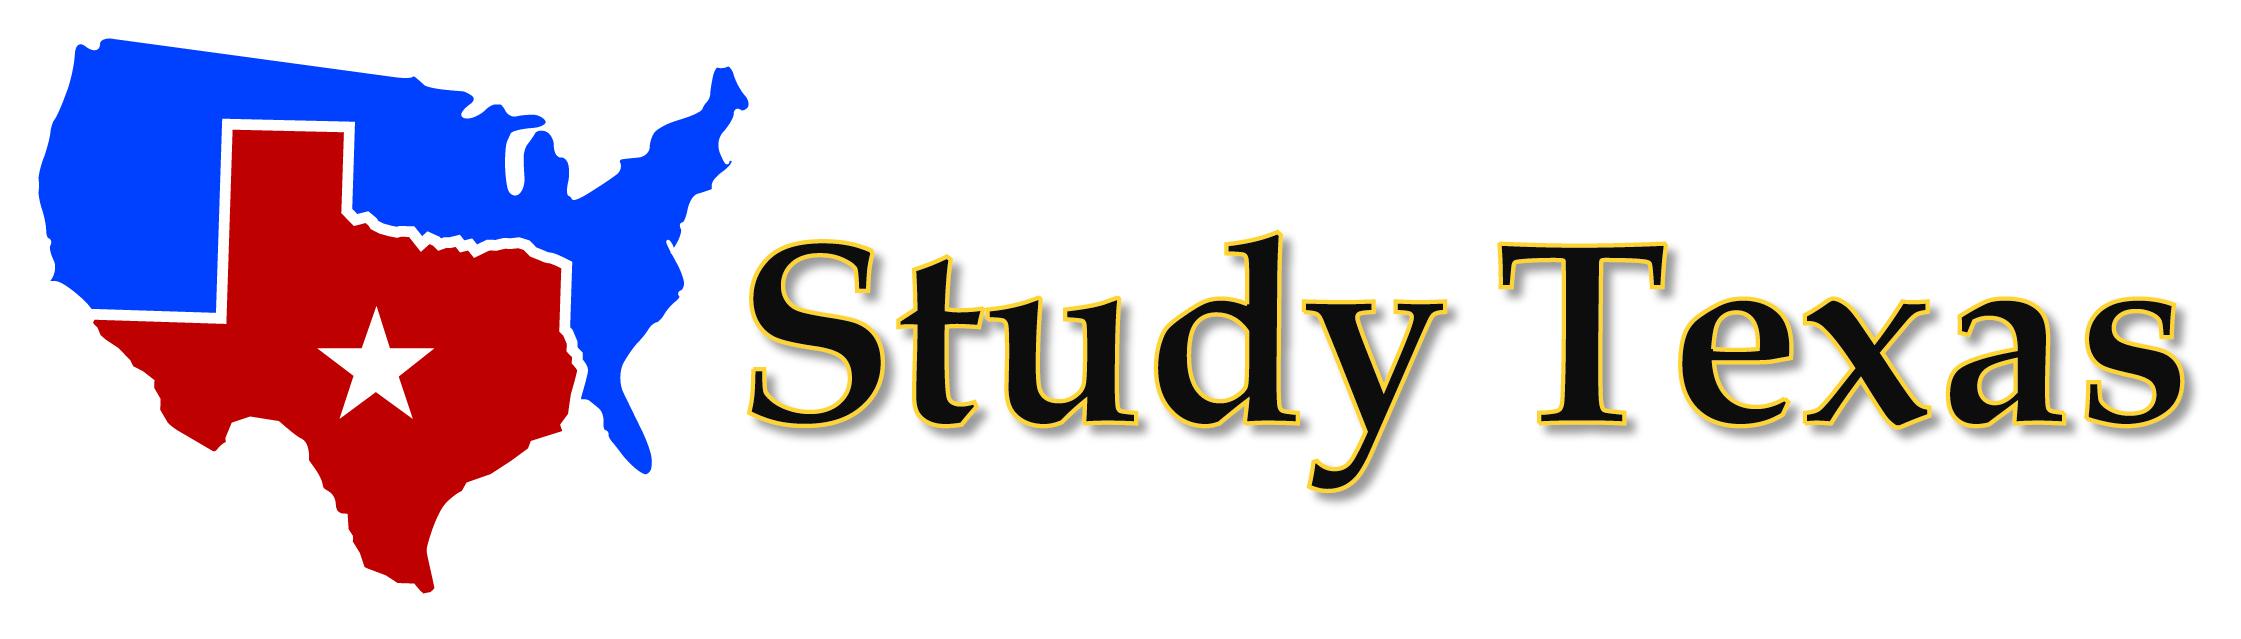 LOGO_Study Texas.jpg